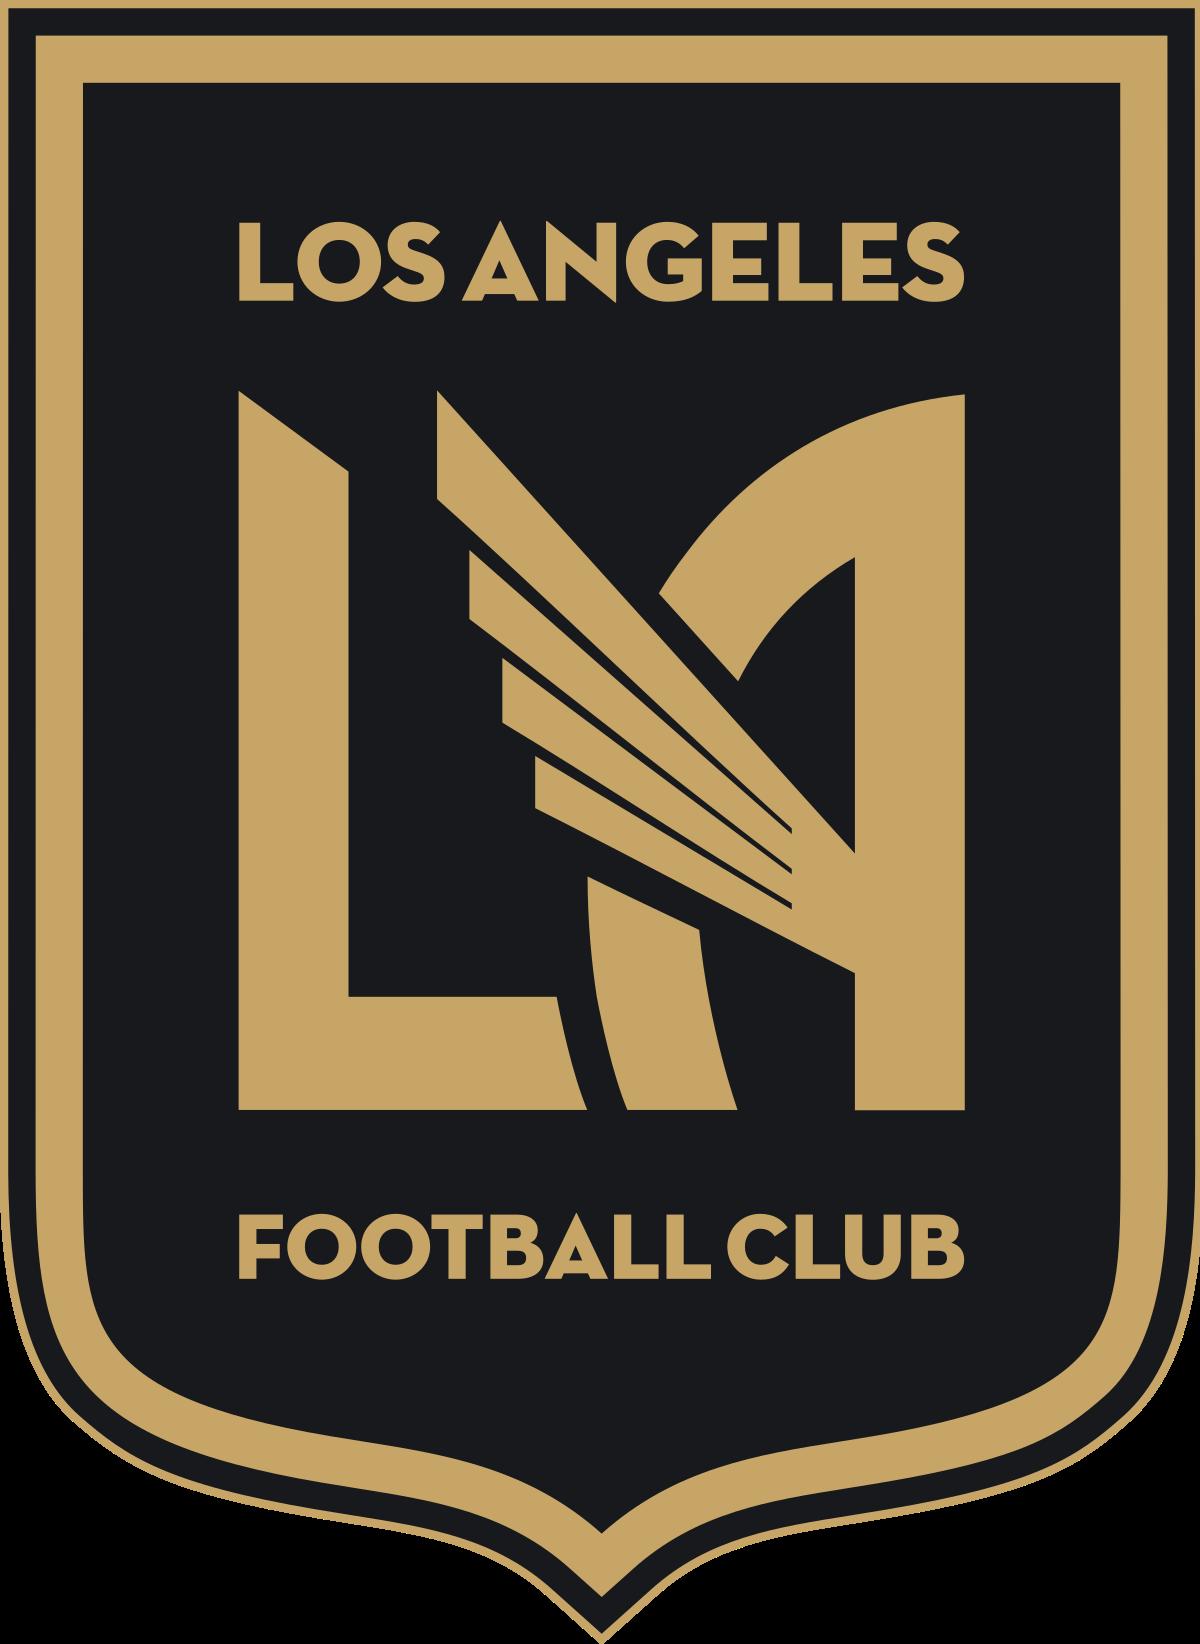 Los_Angeles_Football_Club.png